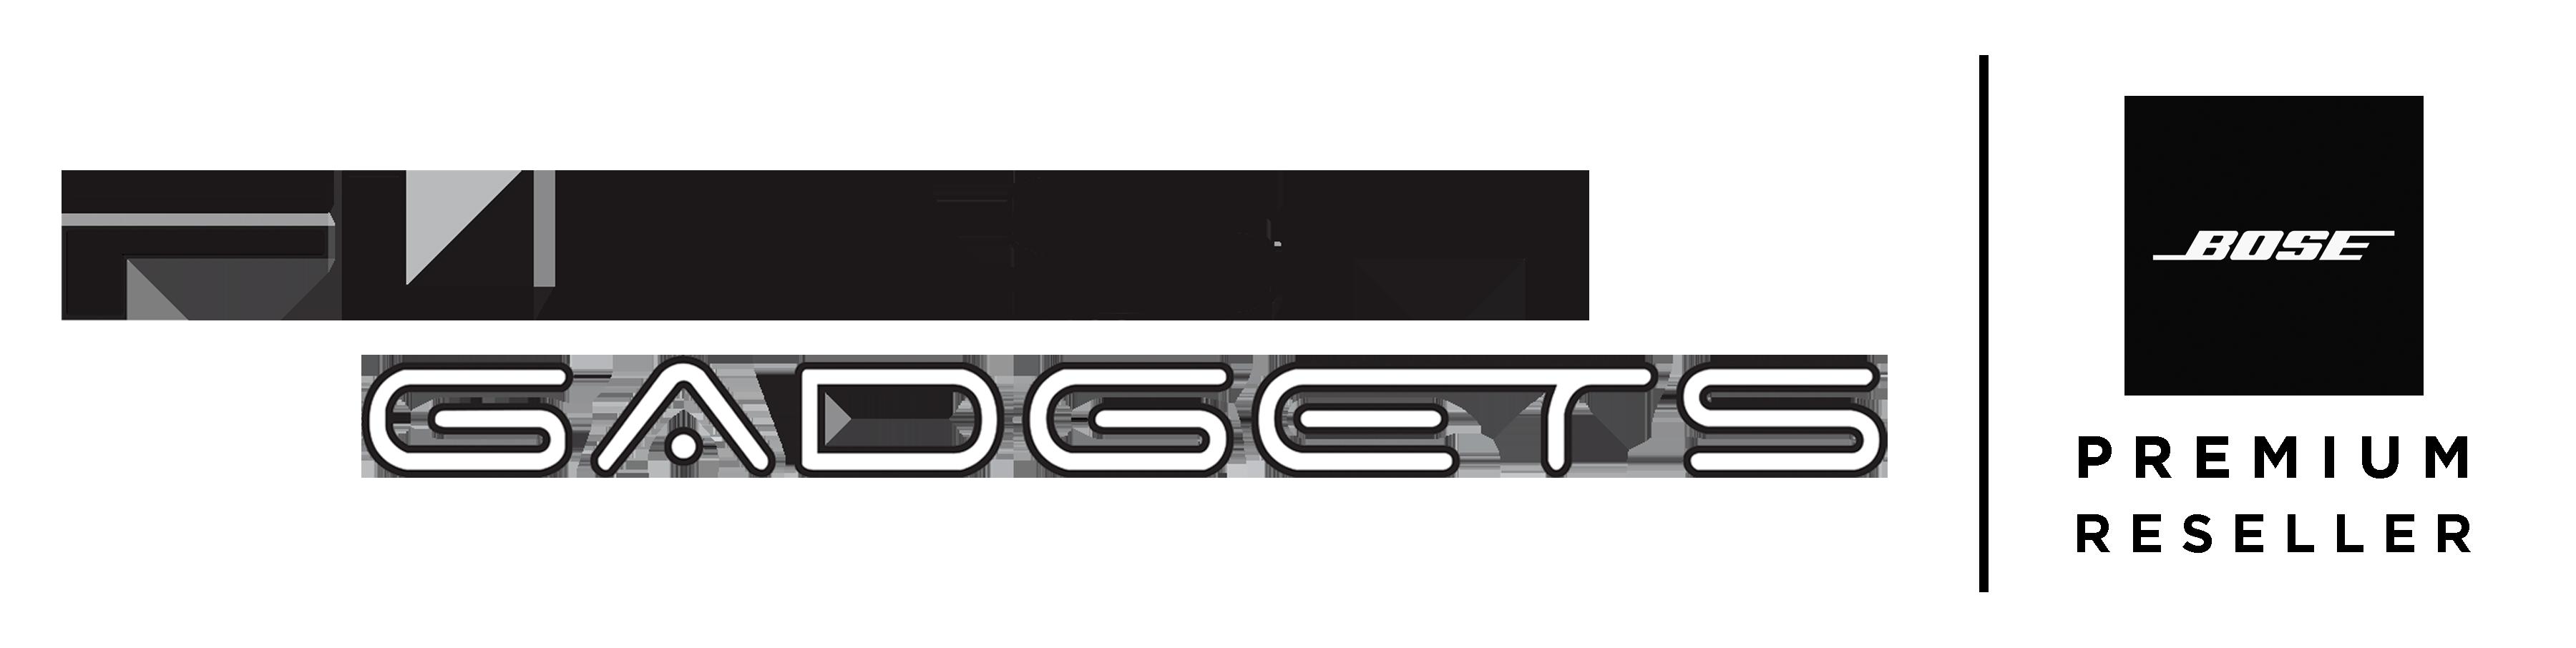 Flash Gadgets | Bose Premium Reseller